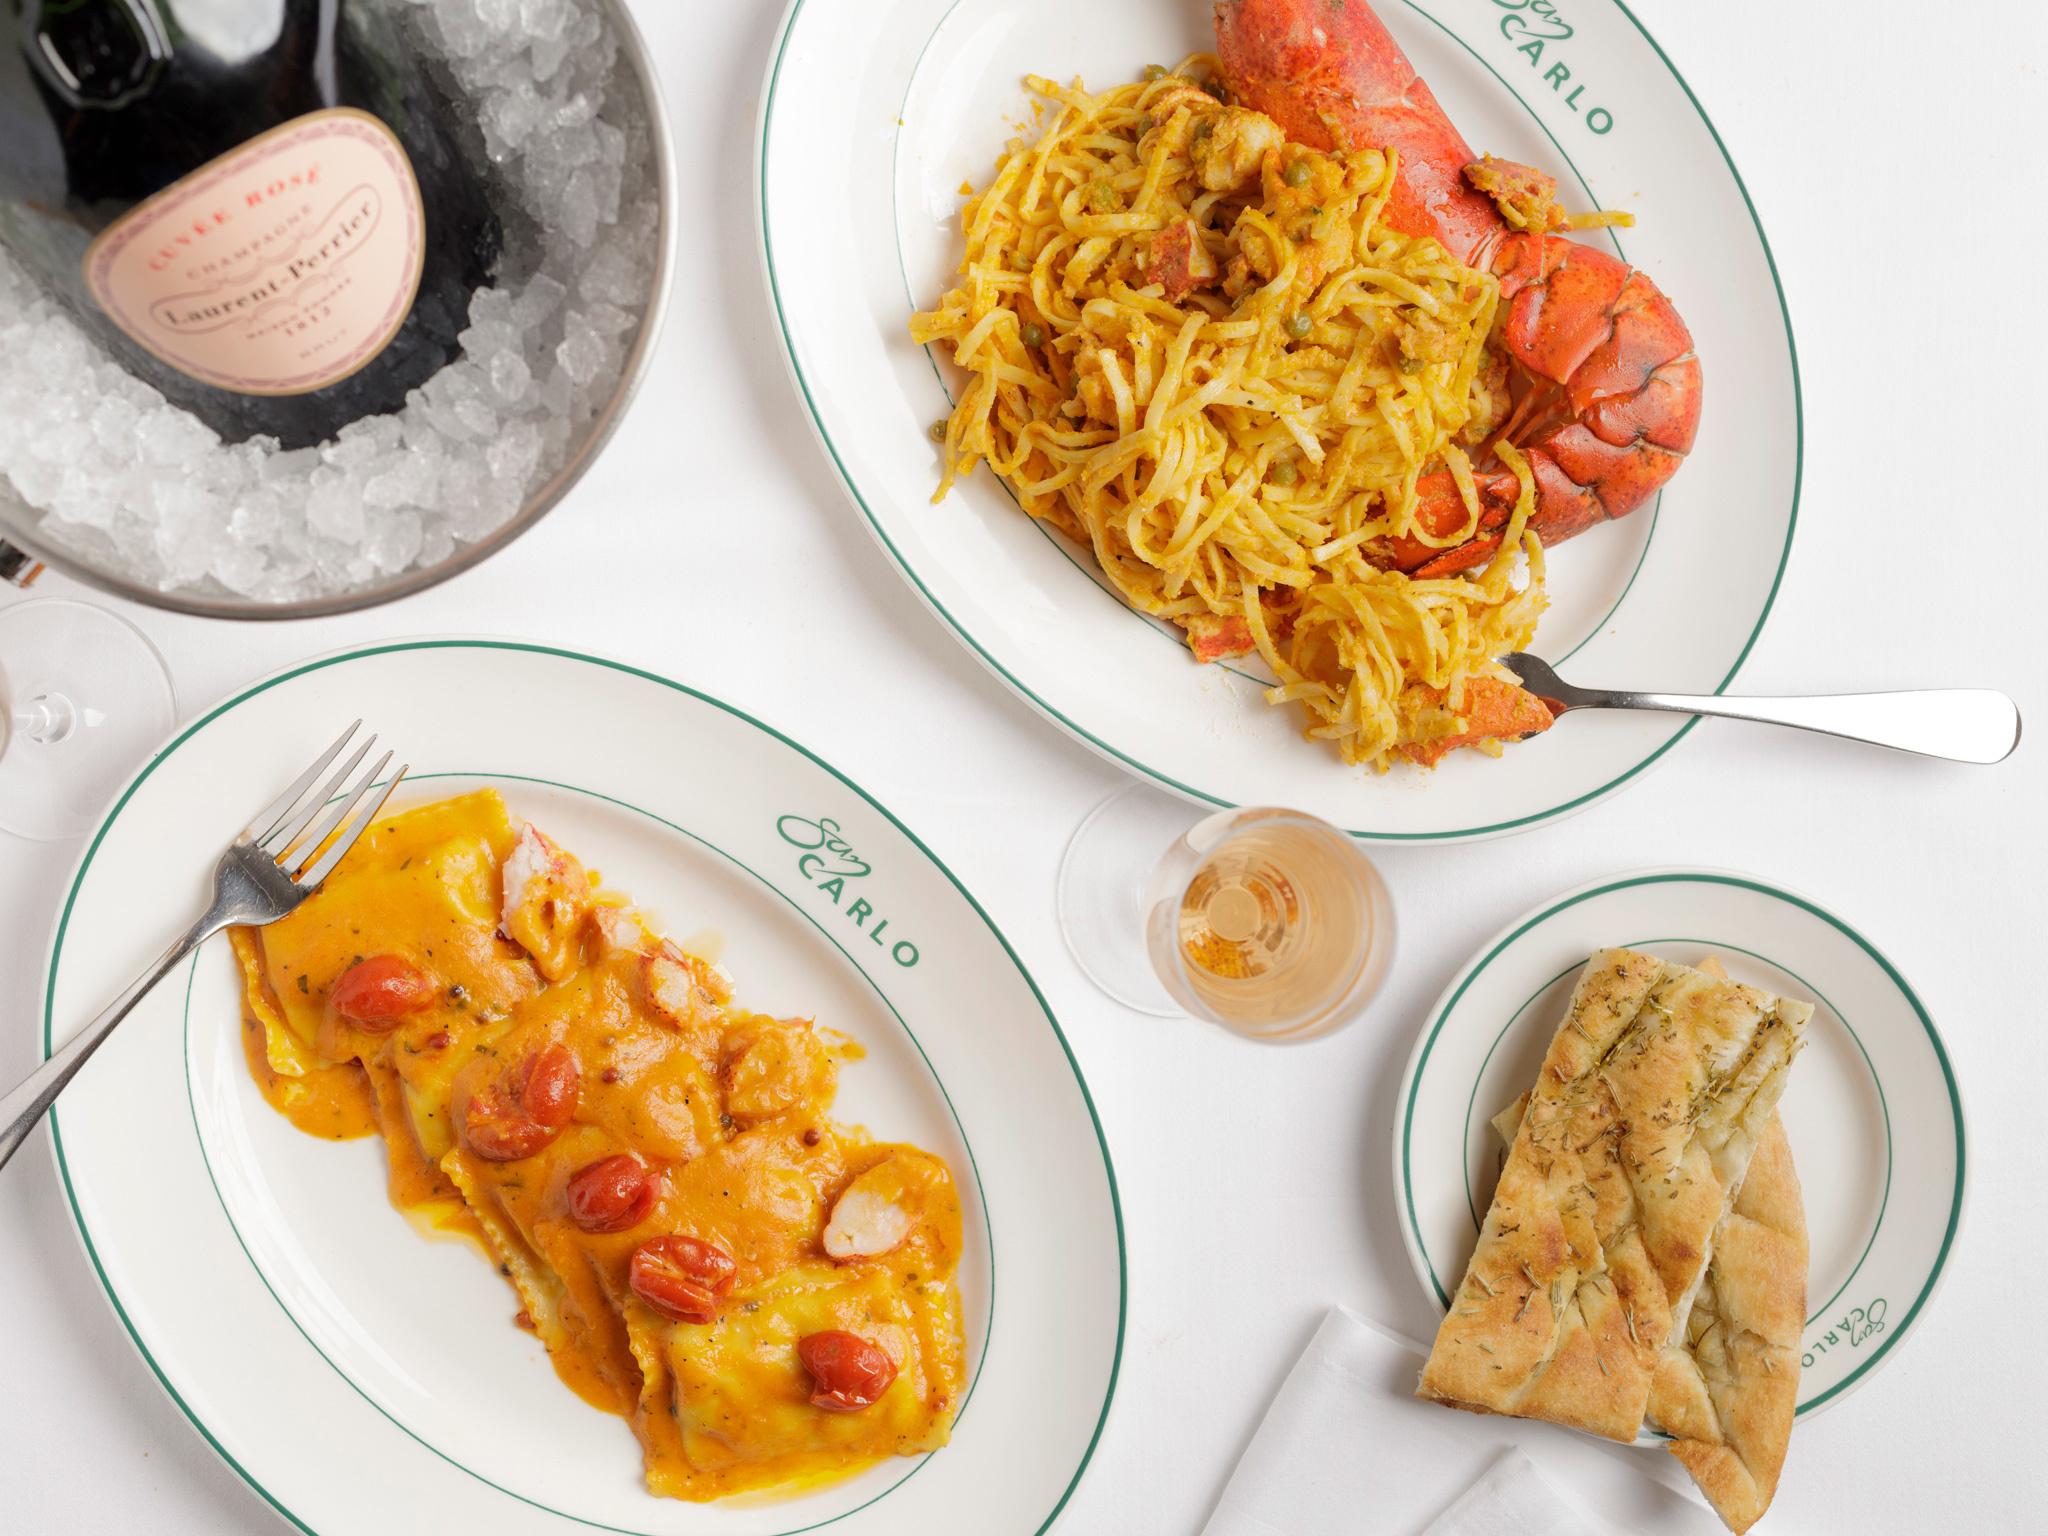 Lobster ravioli at San Carlo in Liverpool